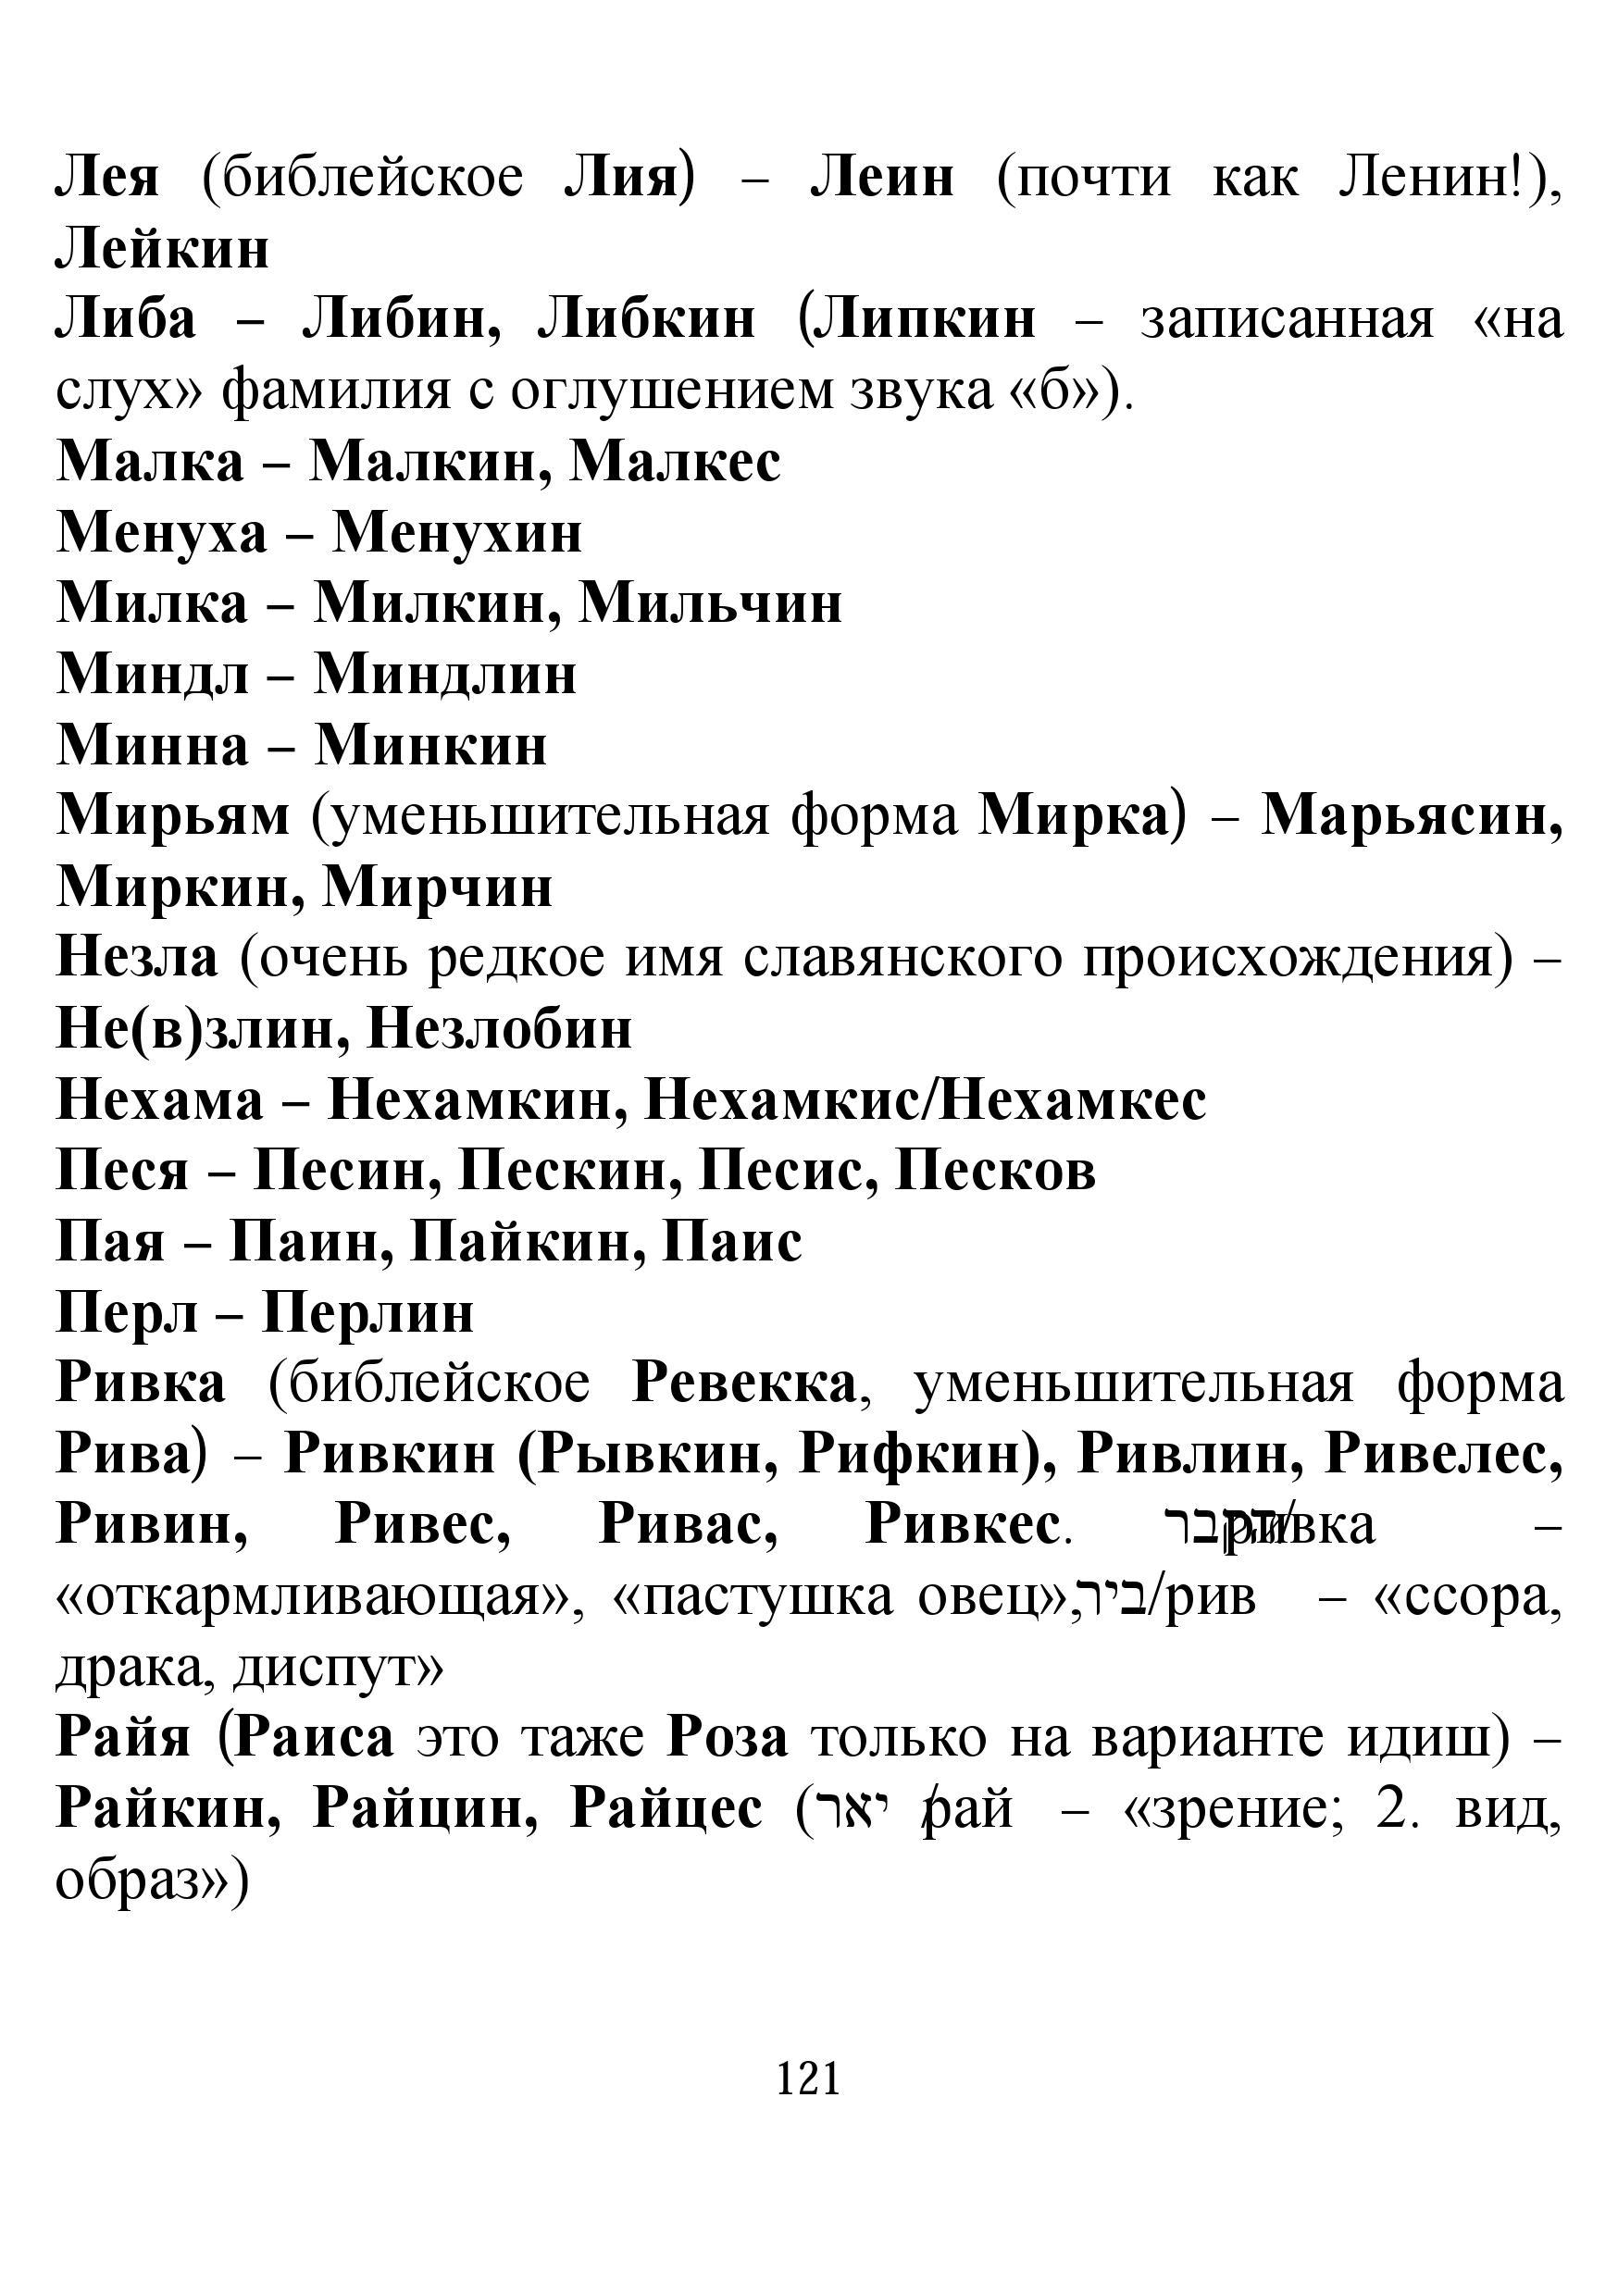 http://se.uploads.ru/i8bKF.jpg